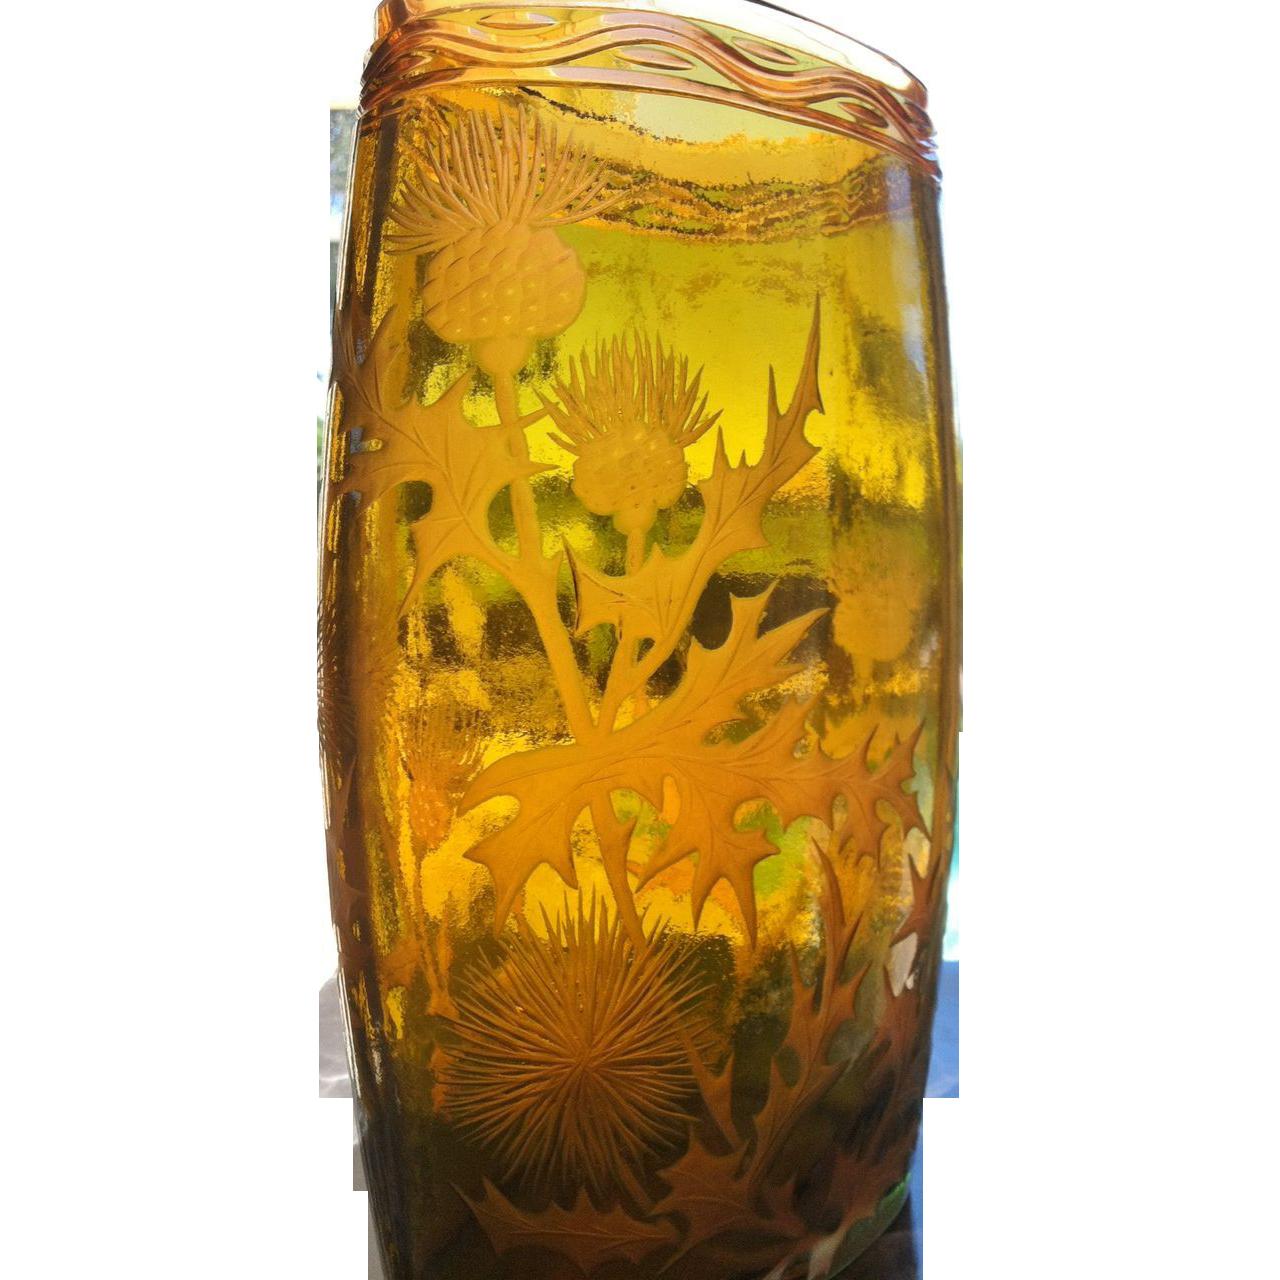 French Art Glass Vase, Wheel Cut Thistles Decor, CA.1930's